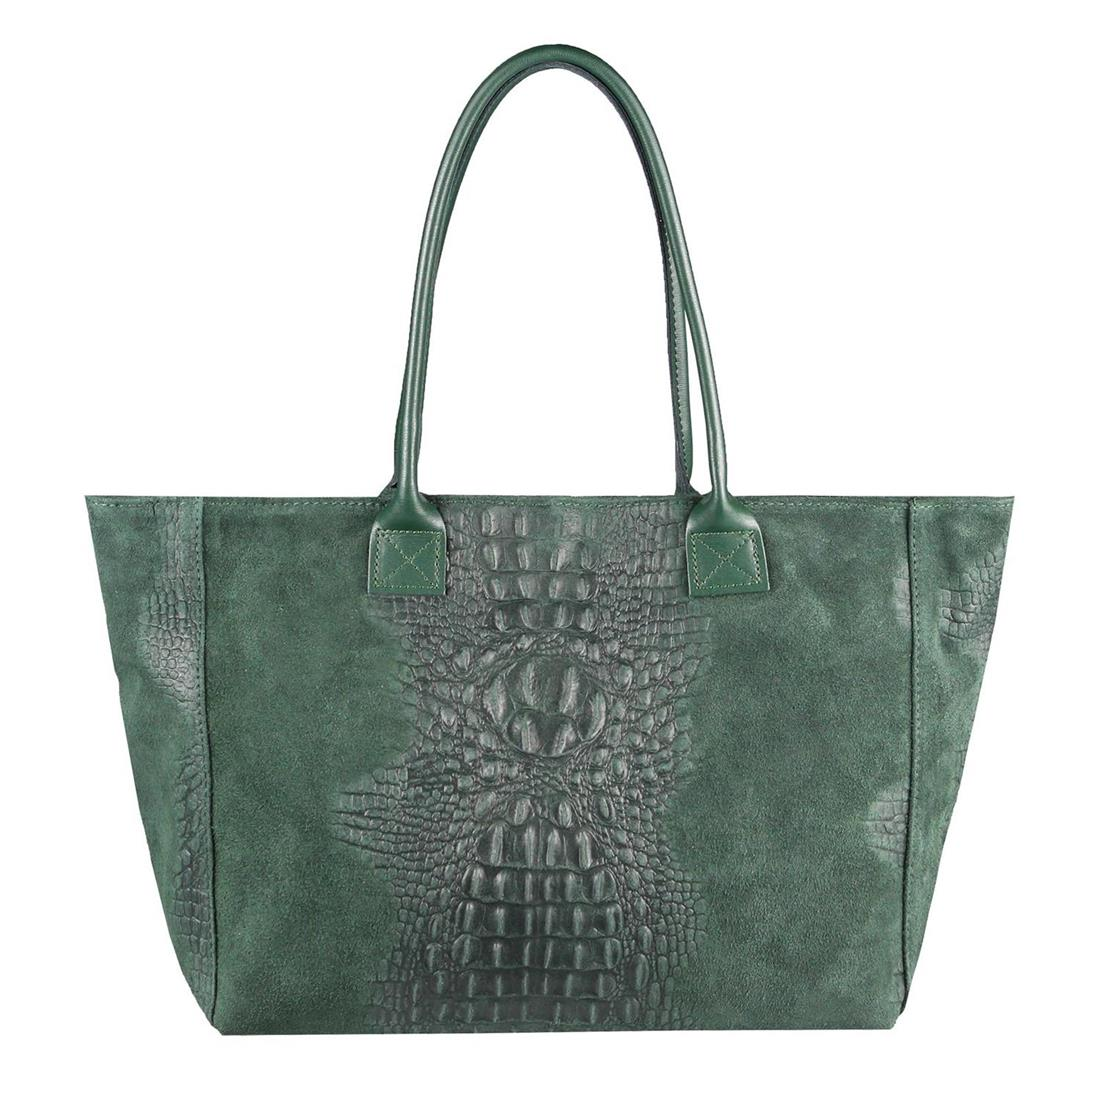 ITALY DAMEN LEDER HANDTASCHE KROKO A4 Shopper Tote Bag Schultertasche Wildleder